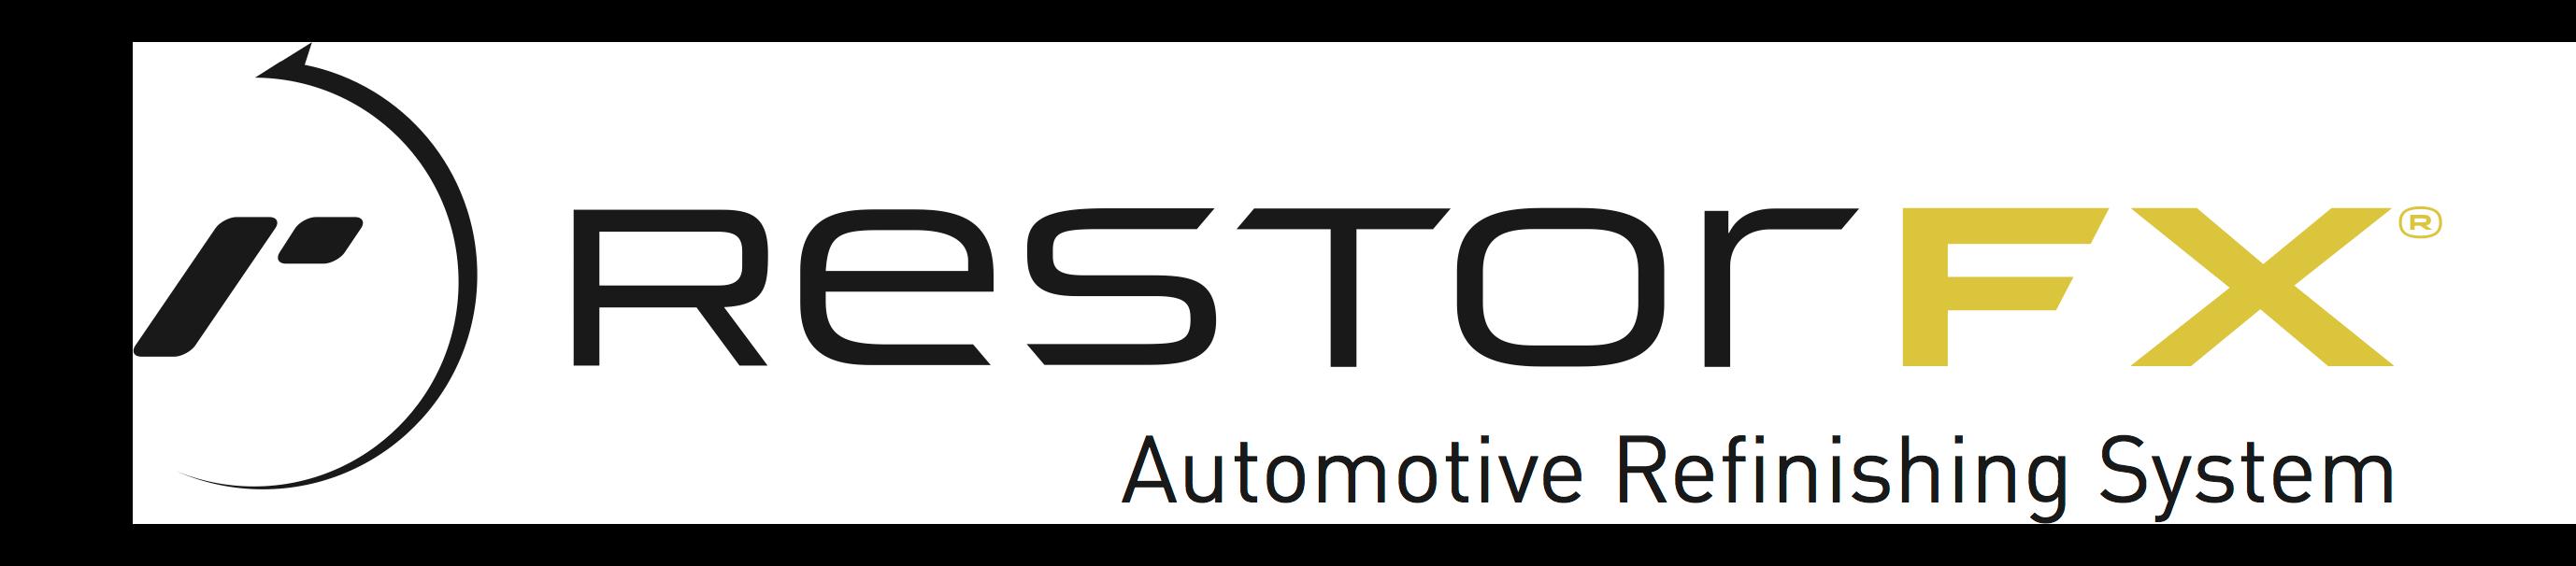 partner logo image